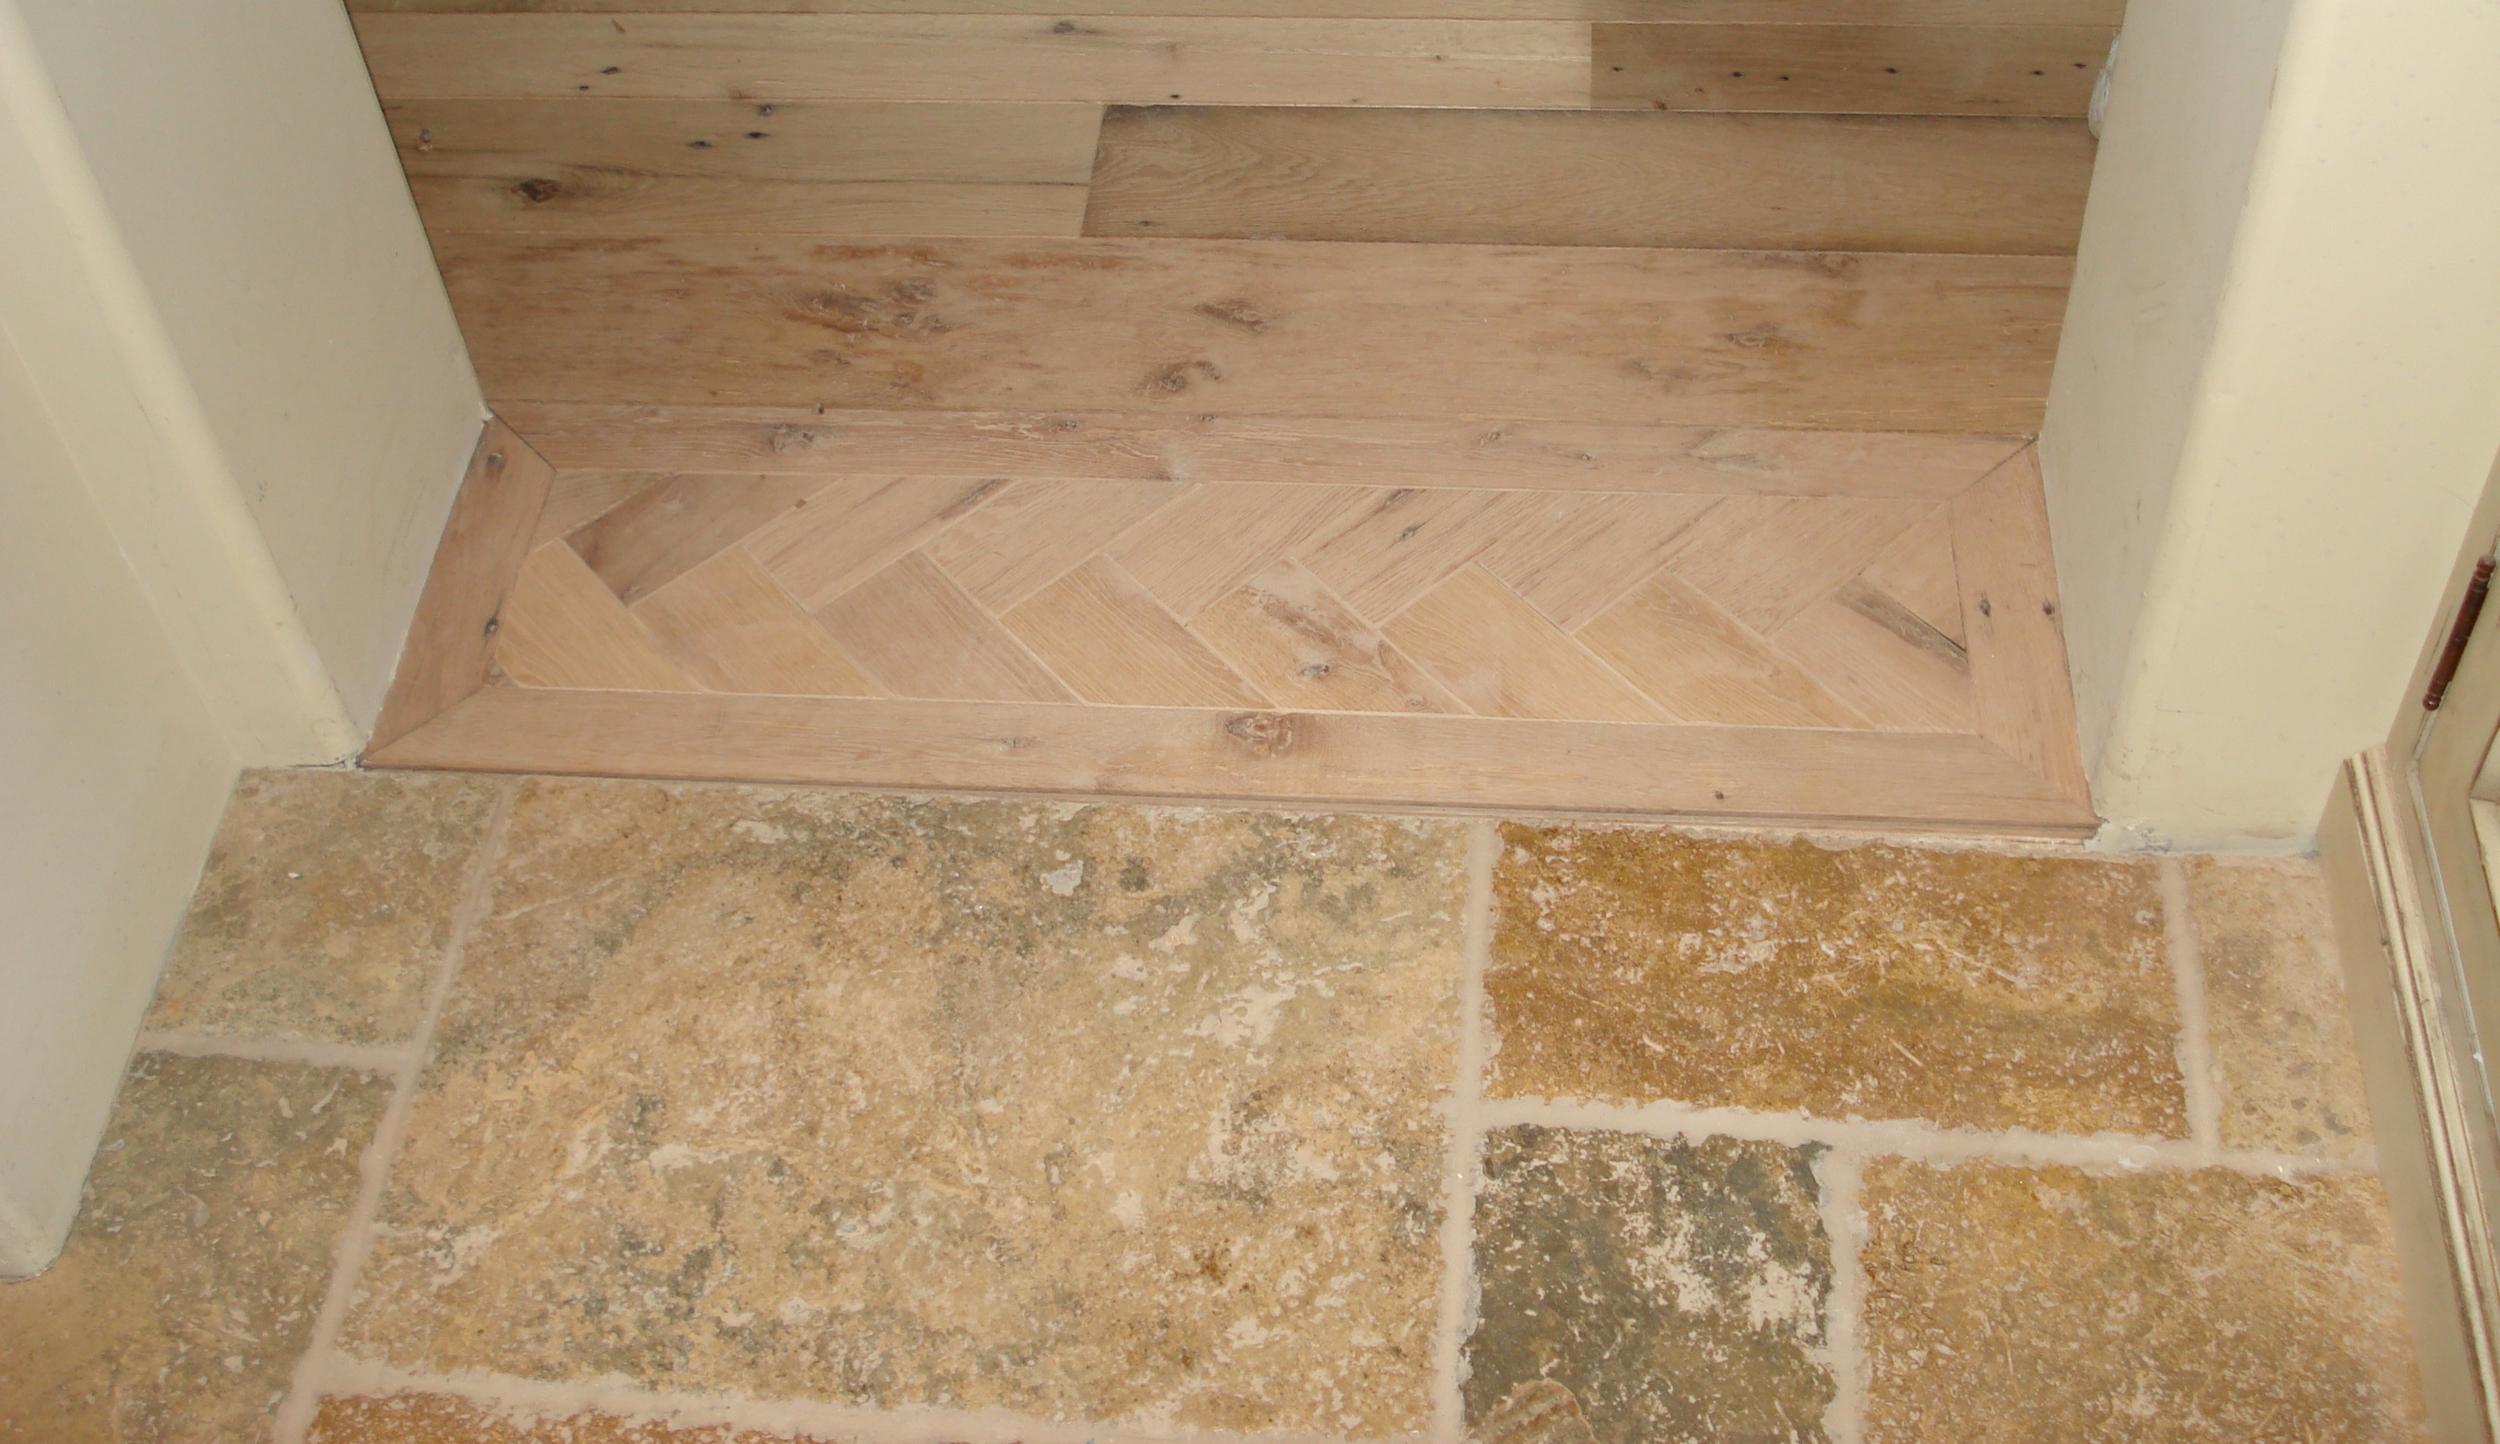 Herringbone pattern flooring transition